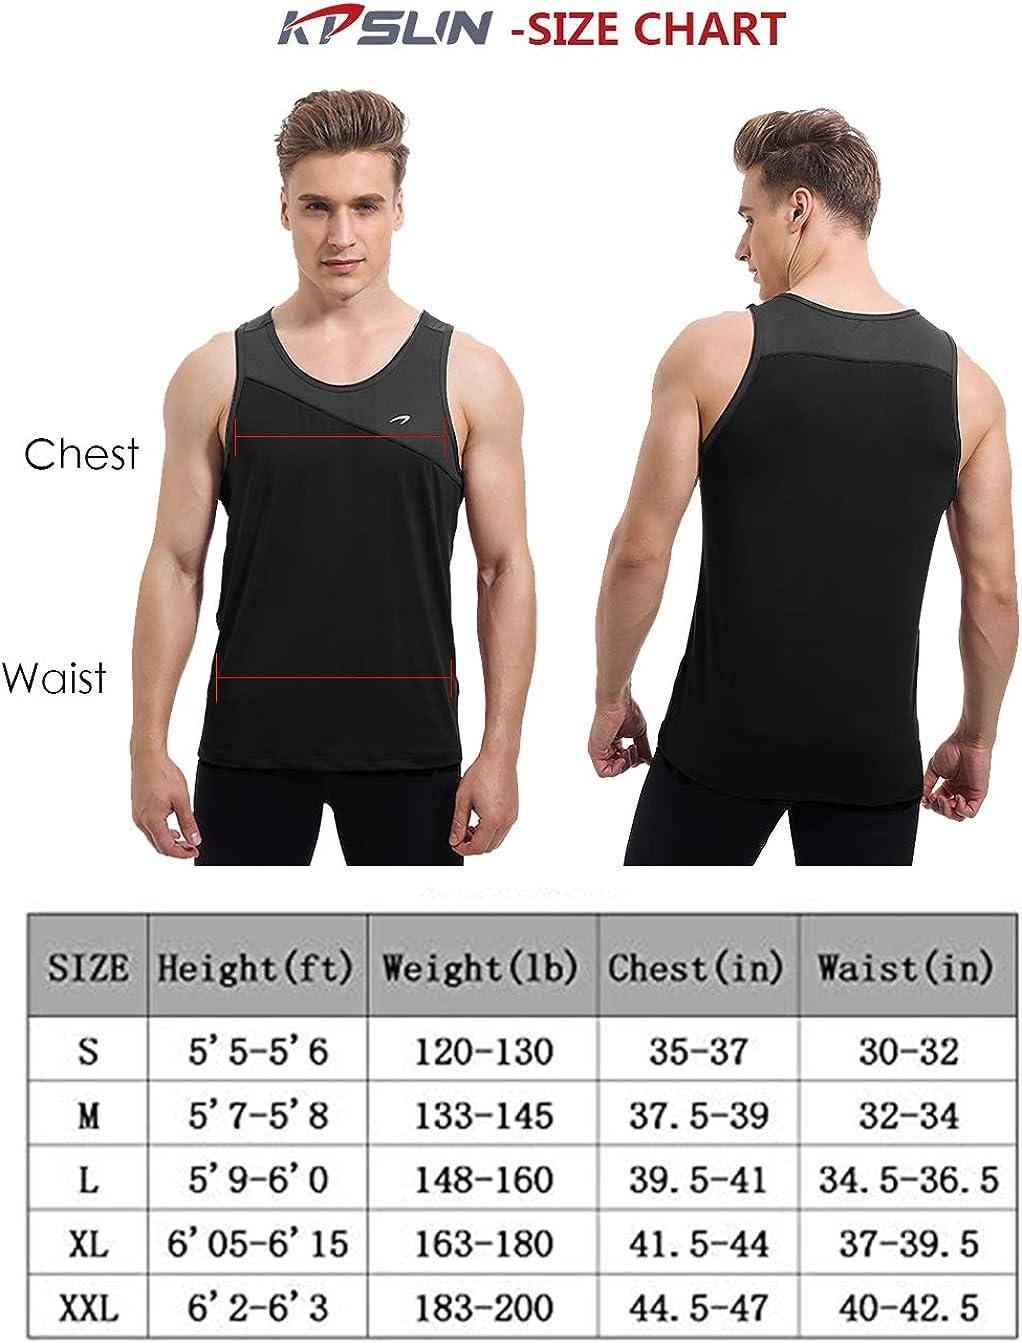 KPSUN Mens Workout Tank Top Quick Dry Athletic Gym Bodybuilding Running Sleeveless Shirt